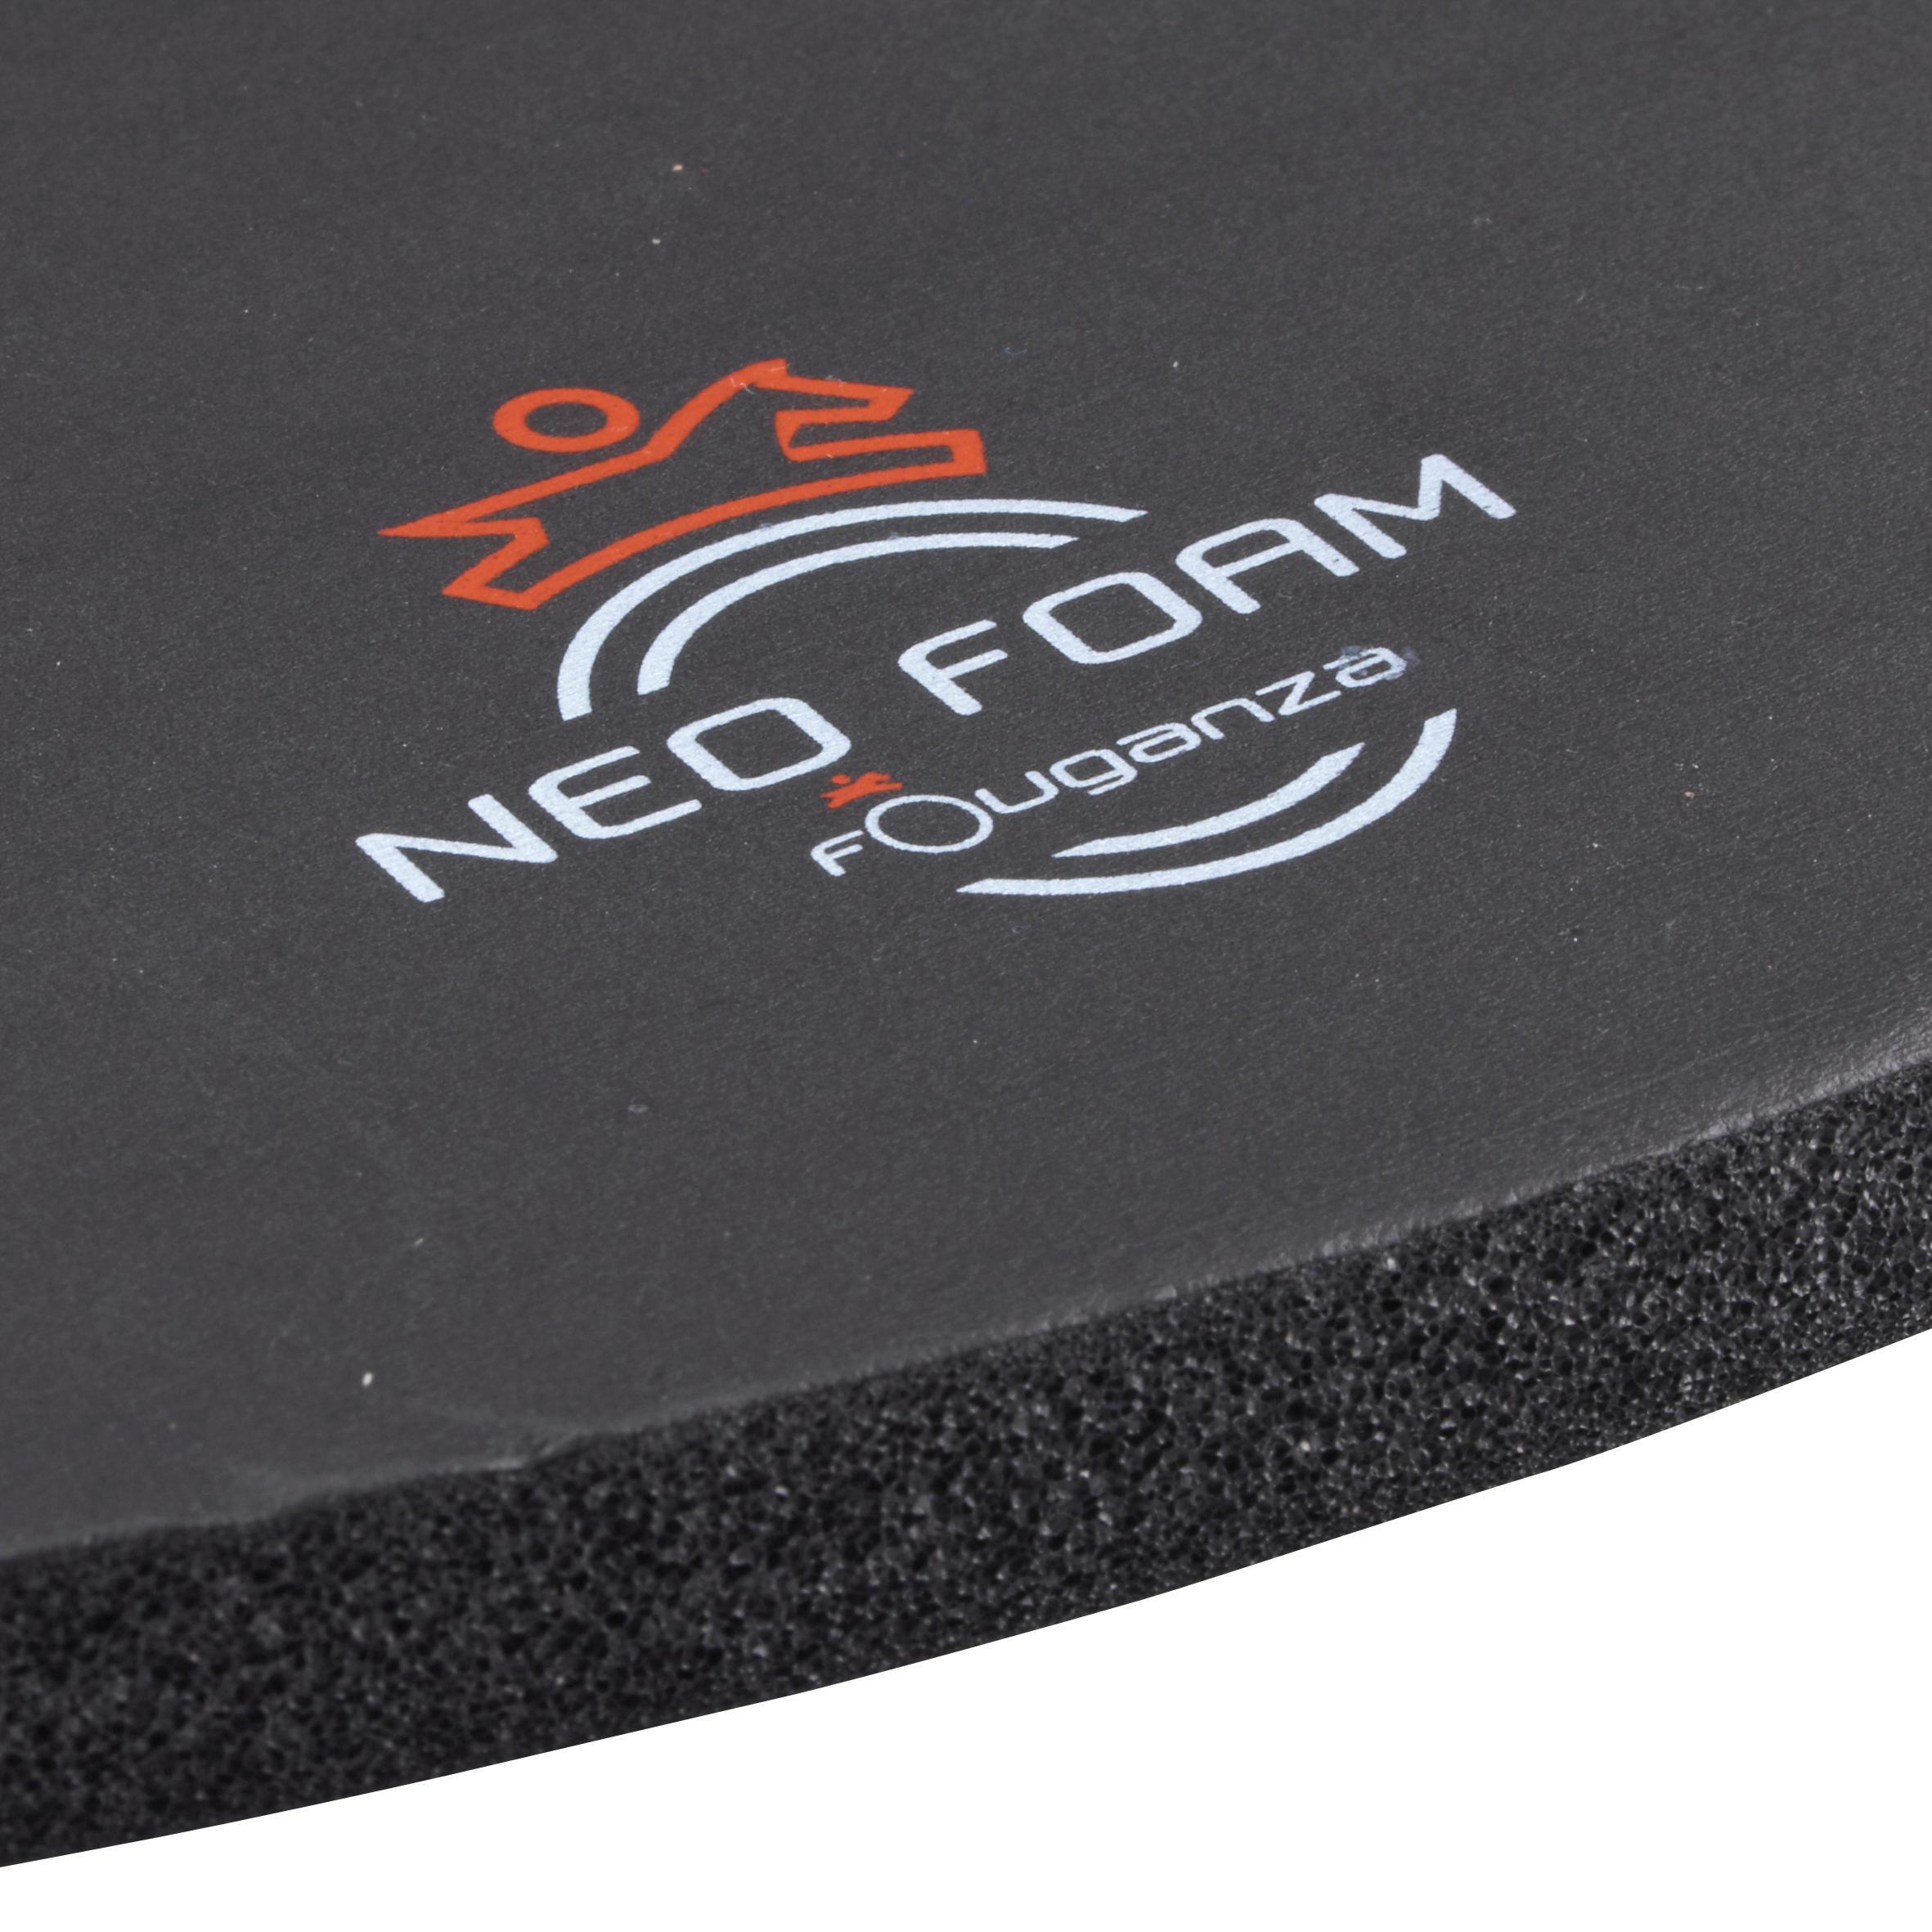 Neo Foam Horse Riding Foam Saddle Pad For Horse/Pony - Black